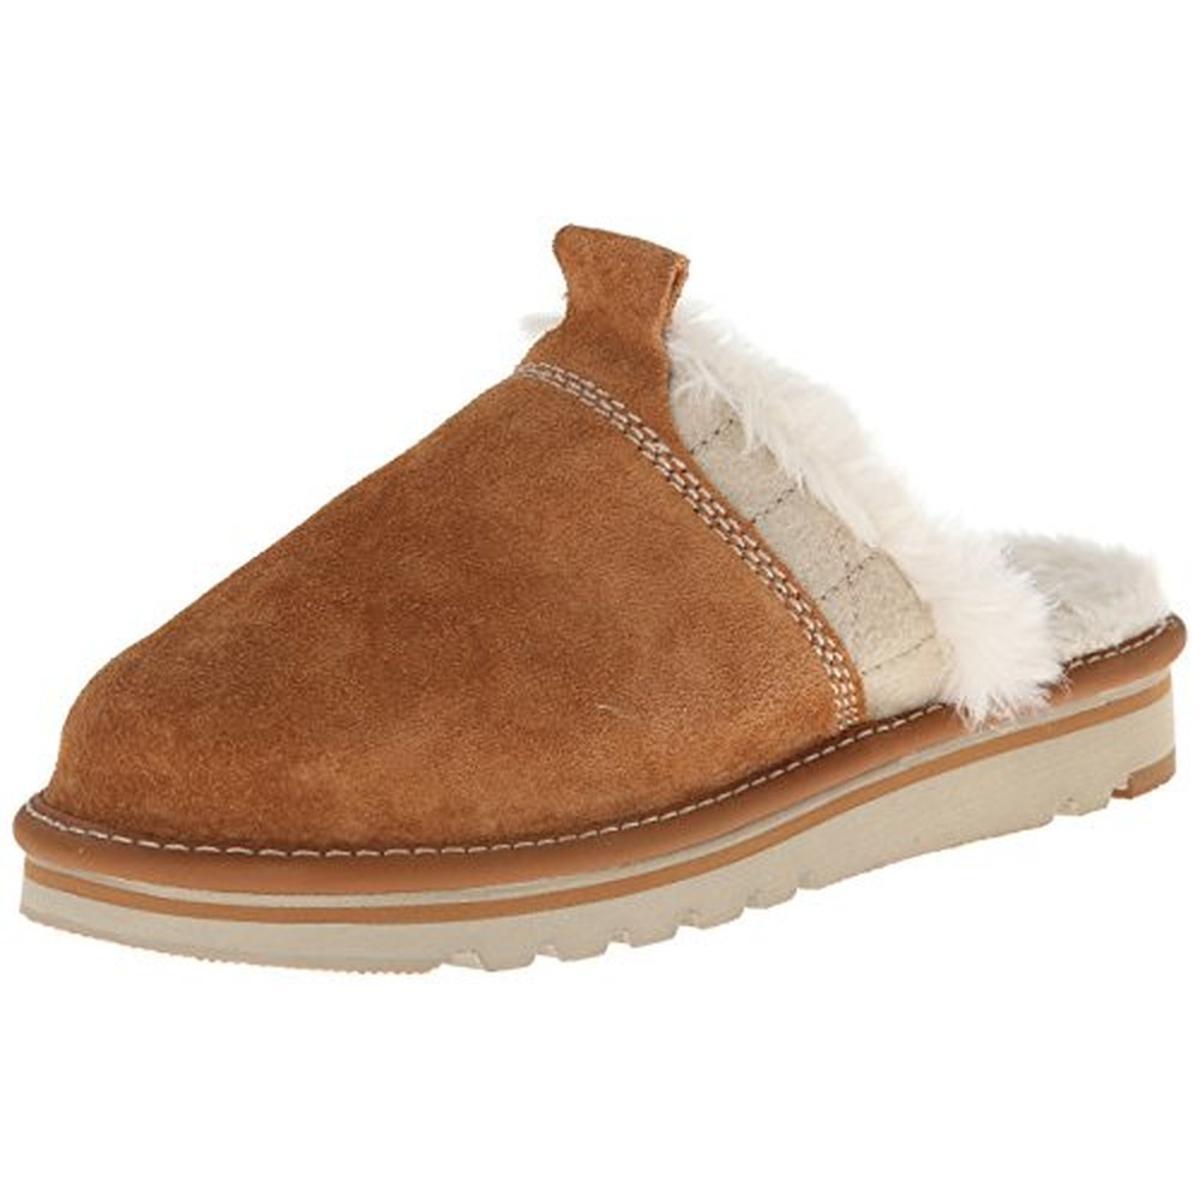 Tan Mules Womens Shoes